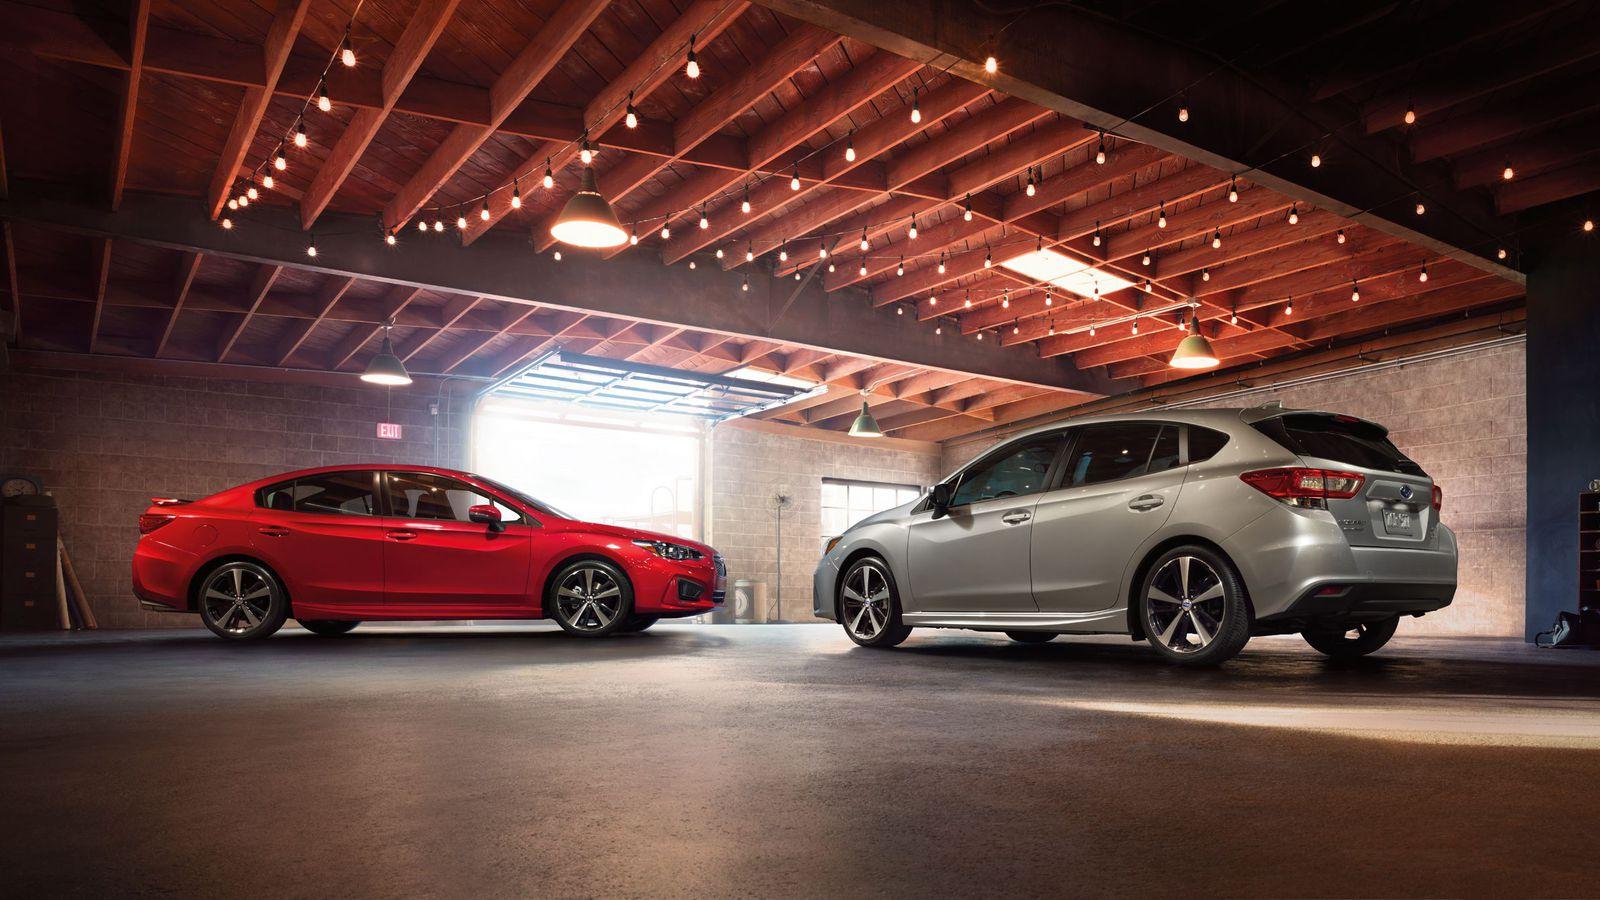 12-2017-impreza-2-0i-sport-sedan-and-2017-impreza-2-0i-sport-5-door